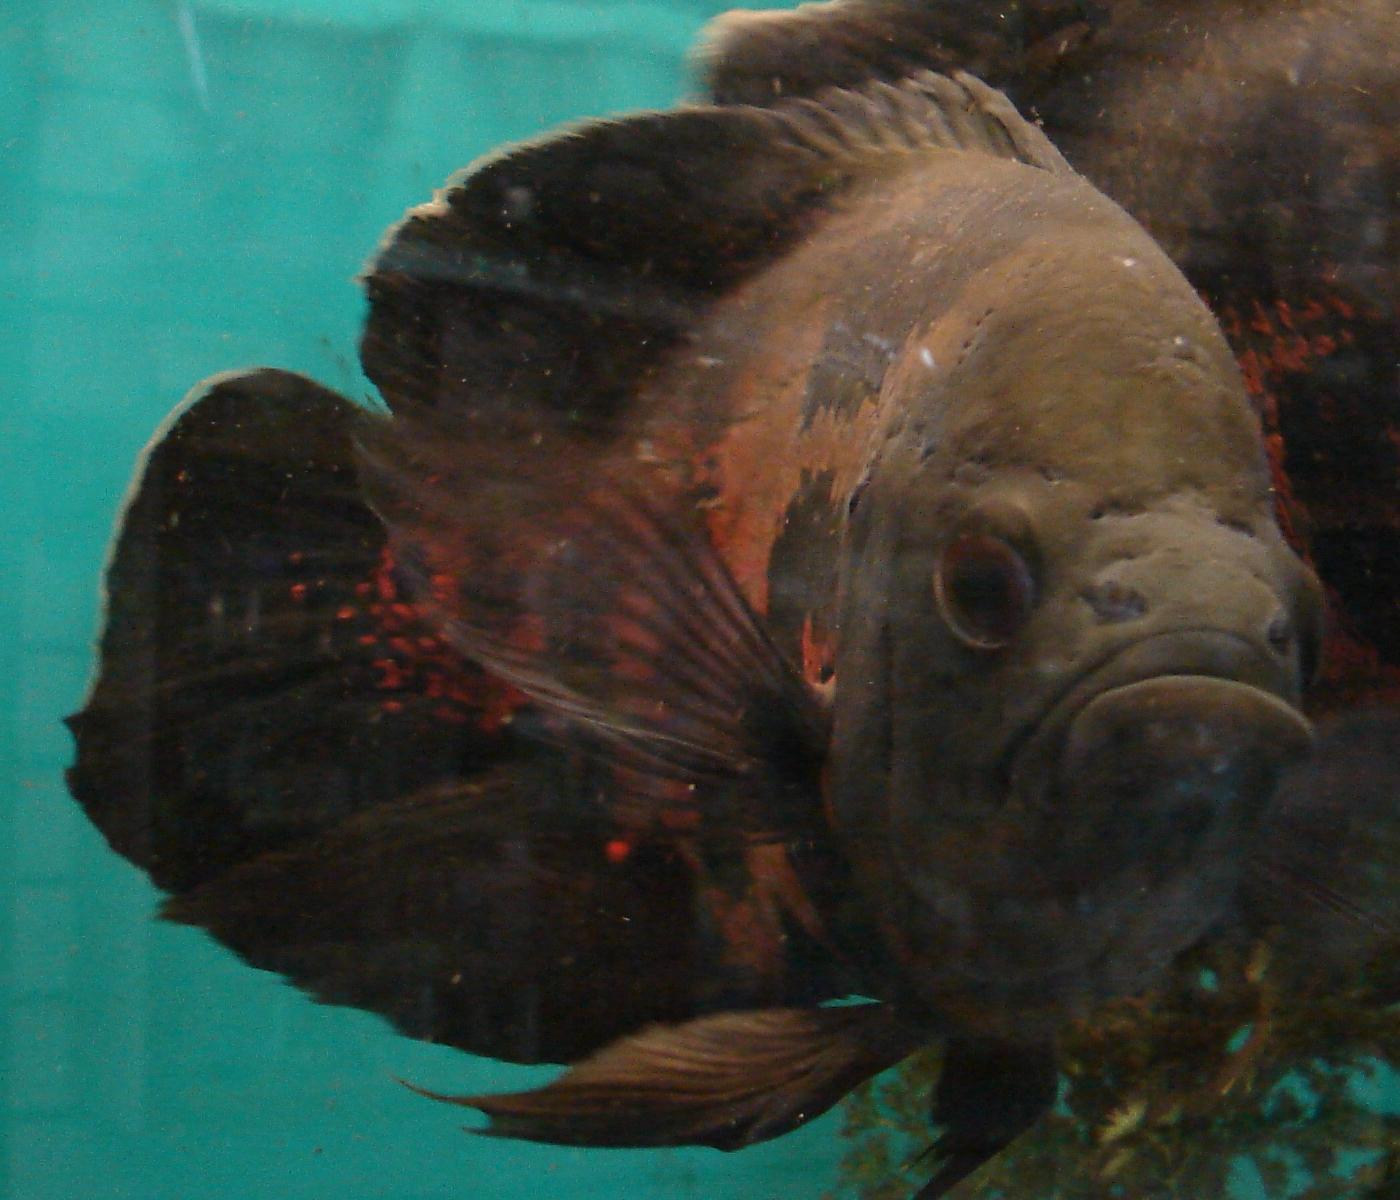 Oscar fish aquarium 3 by fantasystock on deviantart for What is an oscar fish